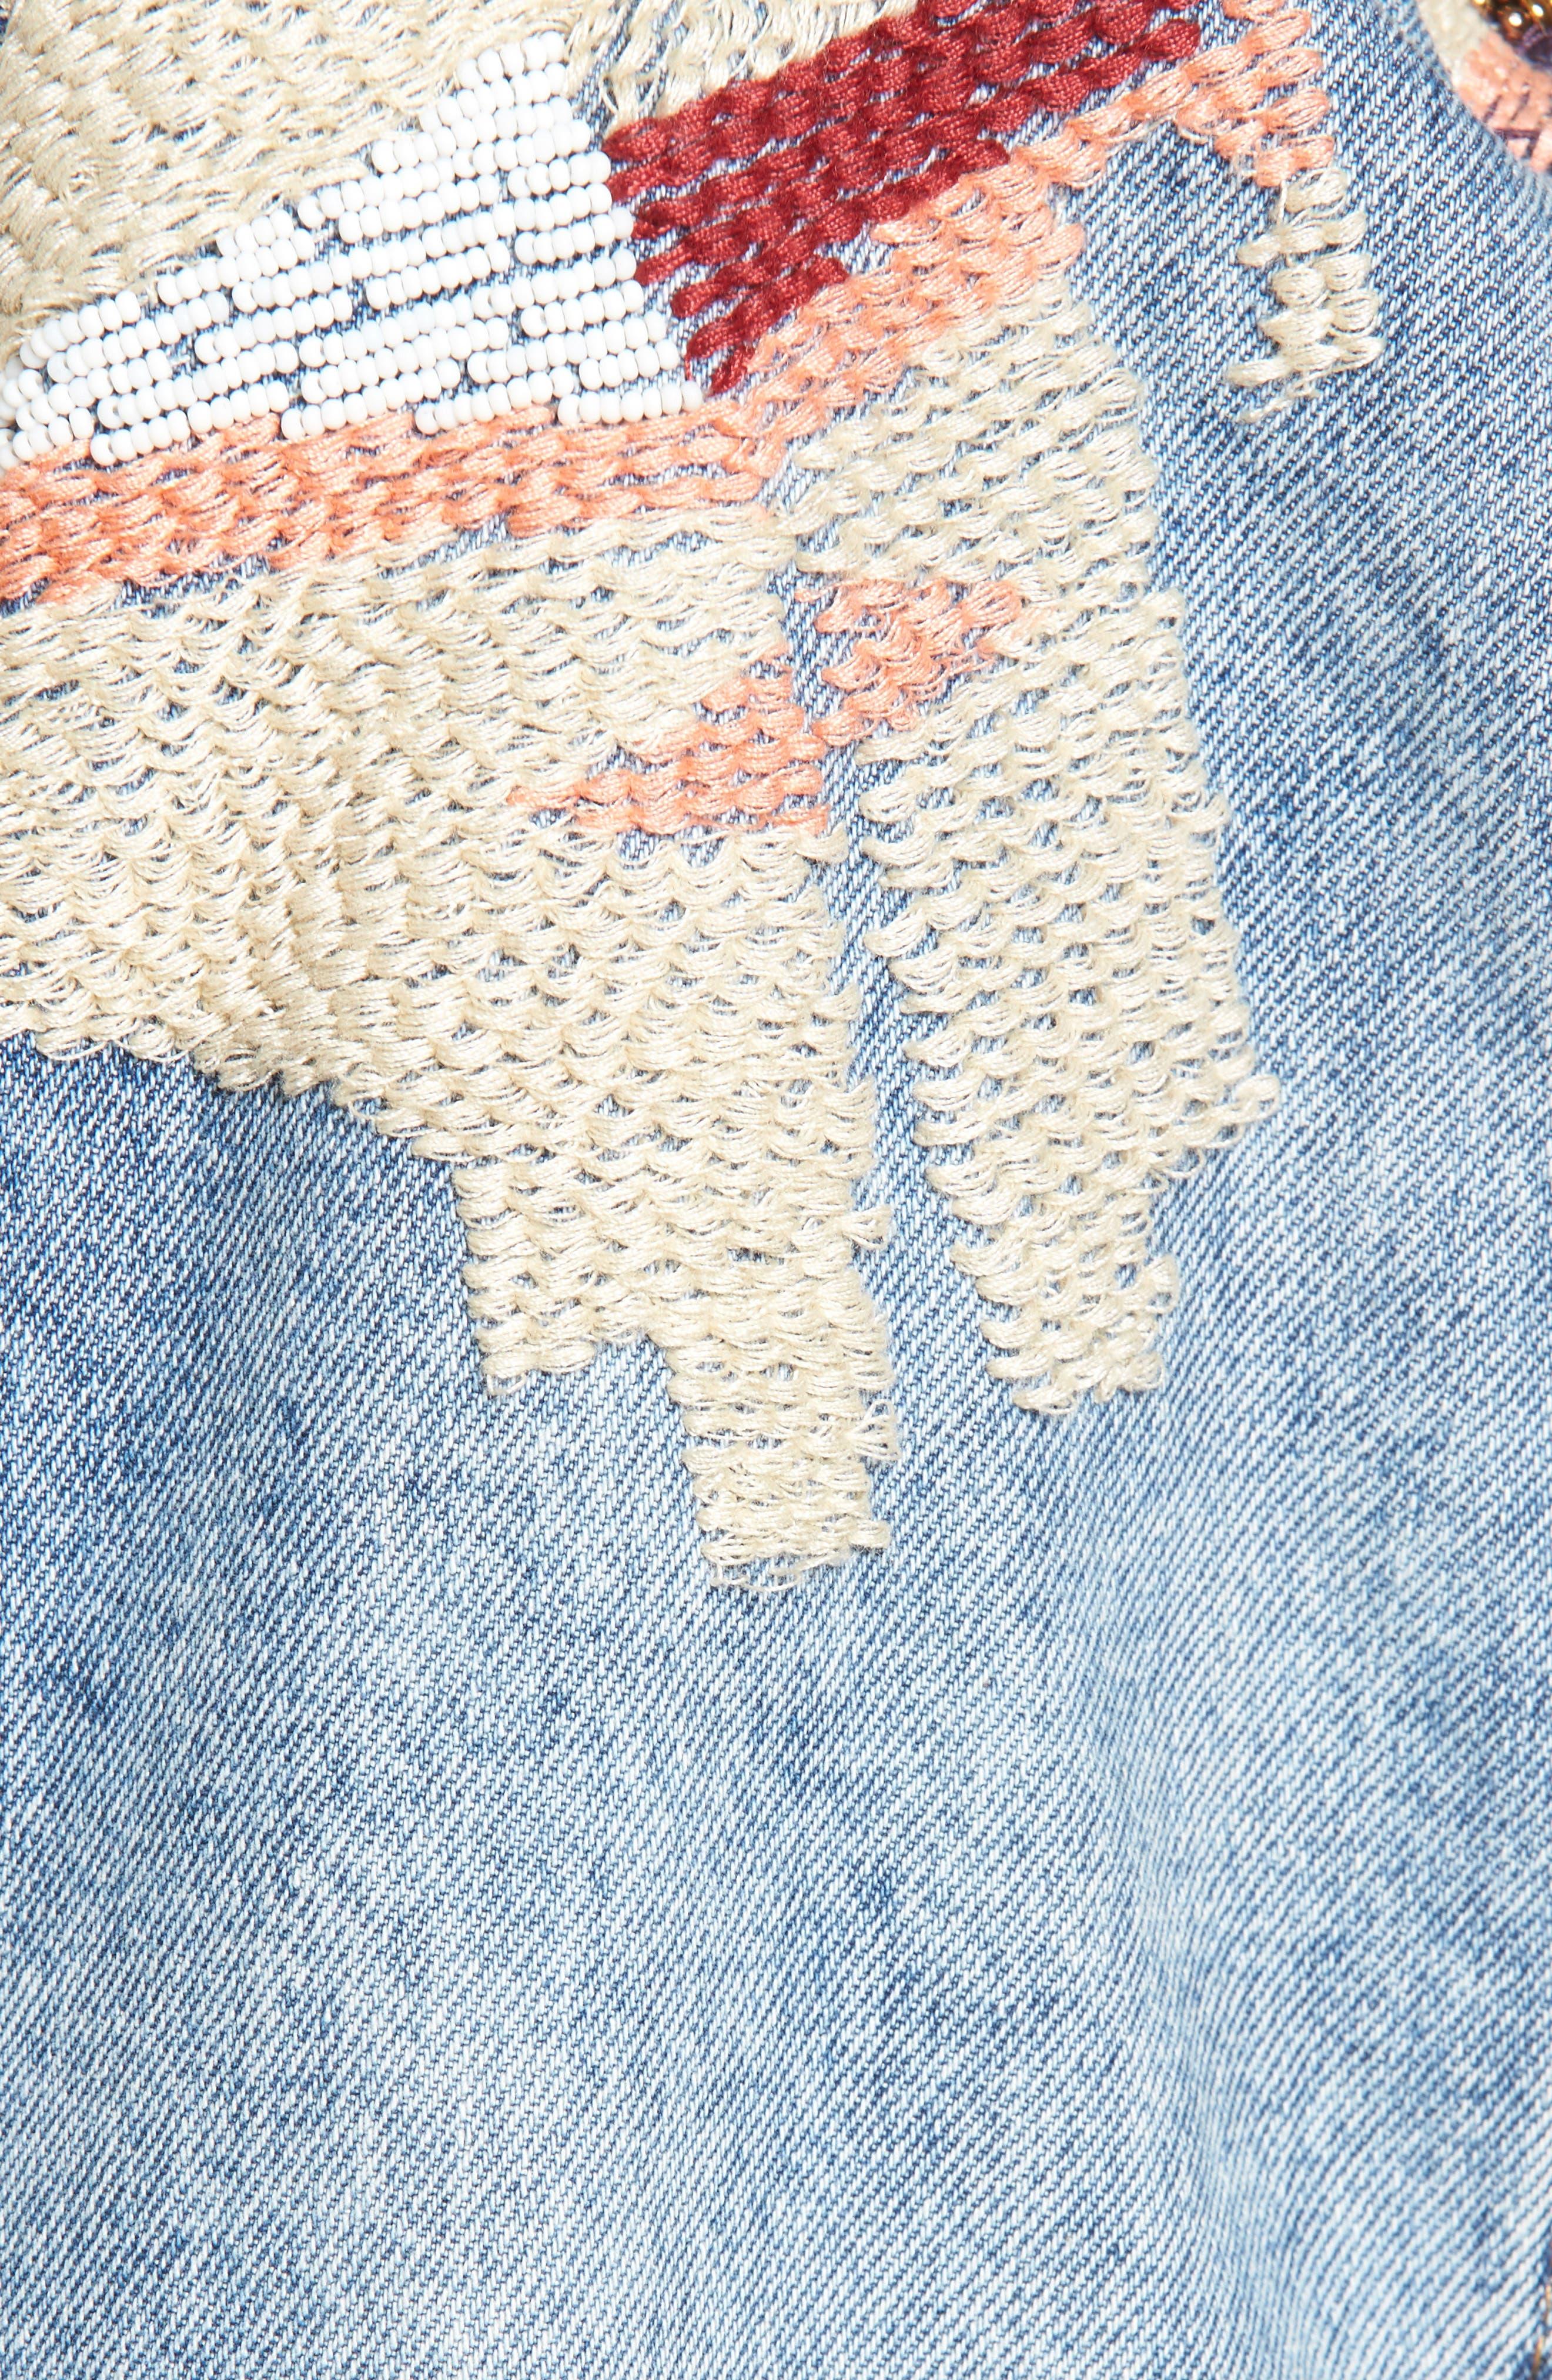 Liquid Summer Beaded Denim Jacket,                             Alternate thumbnail 6, color,